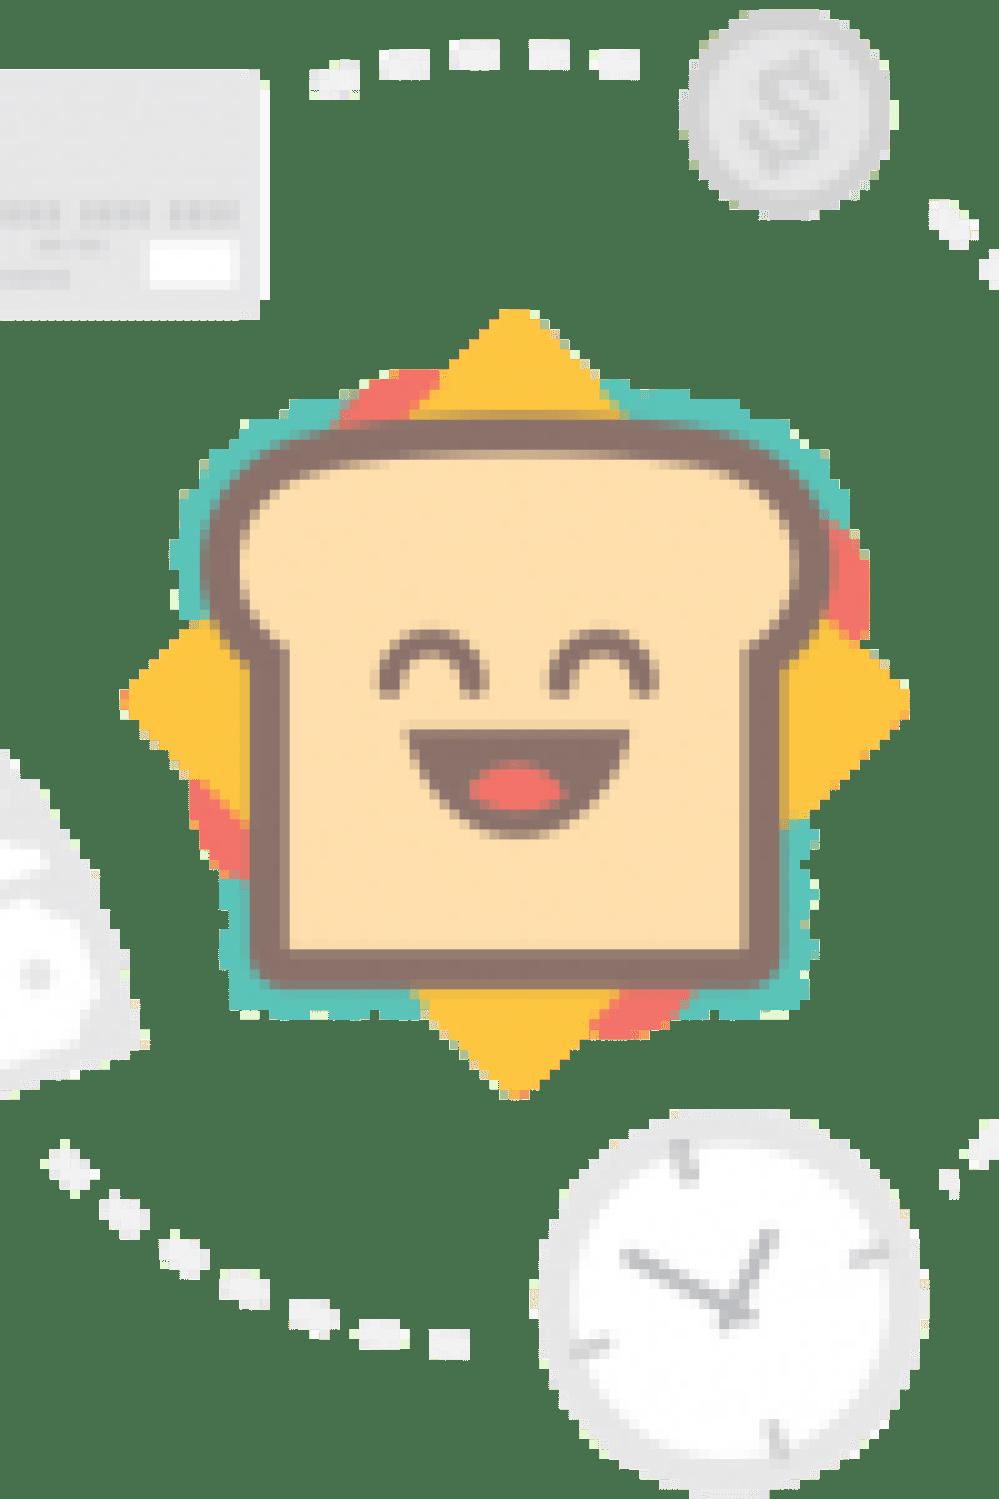 hm silver silk midi dress romantic girl street style look ootd stylish bloger